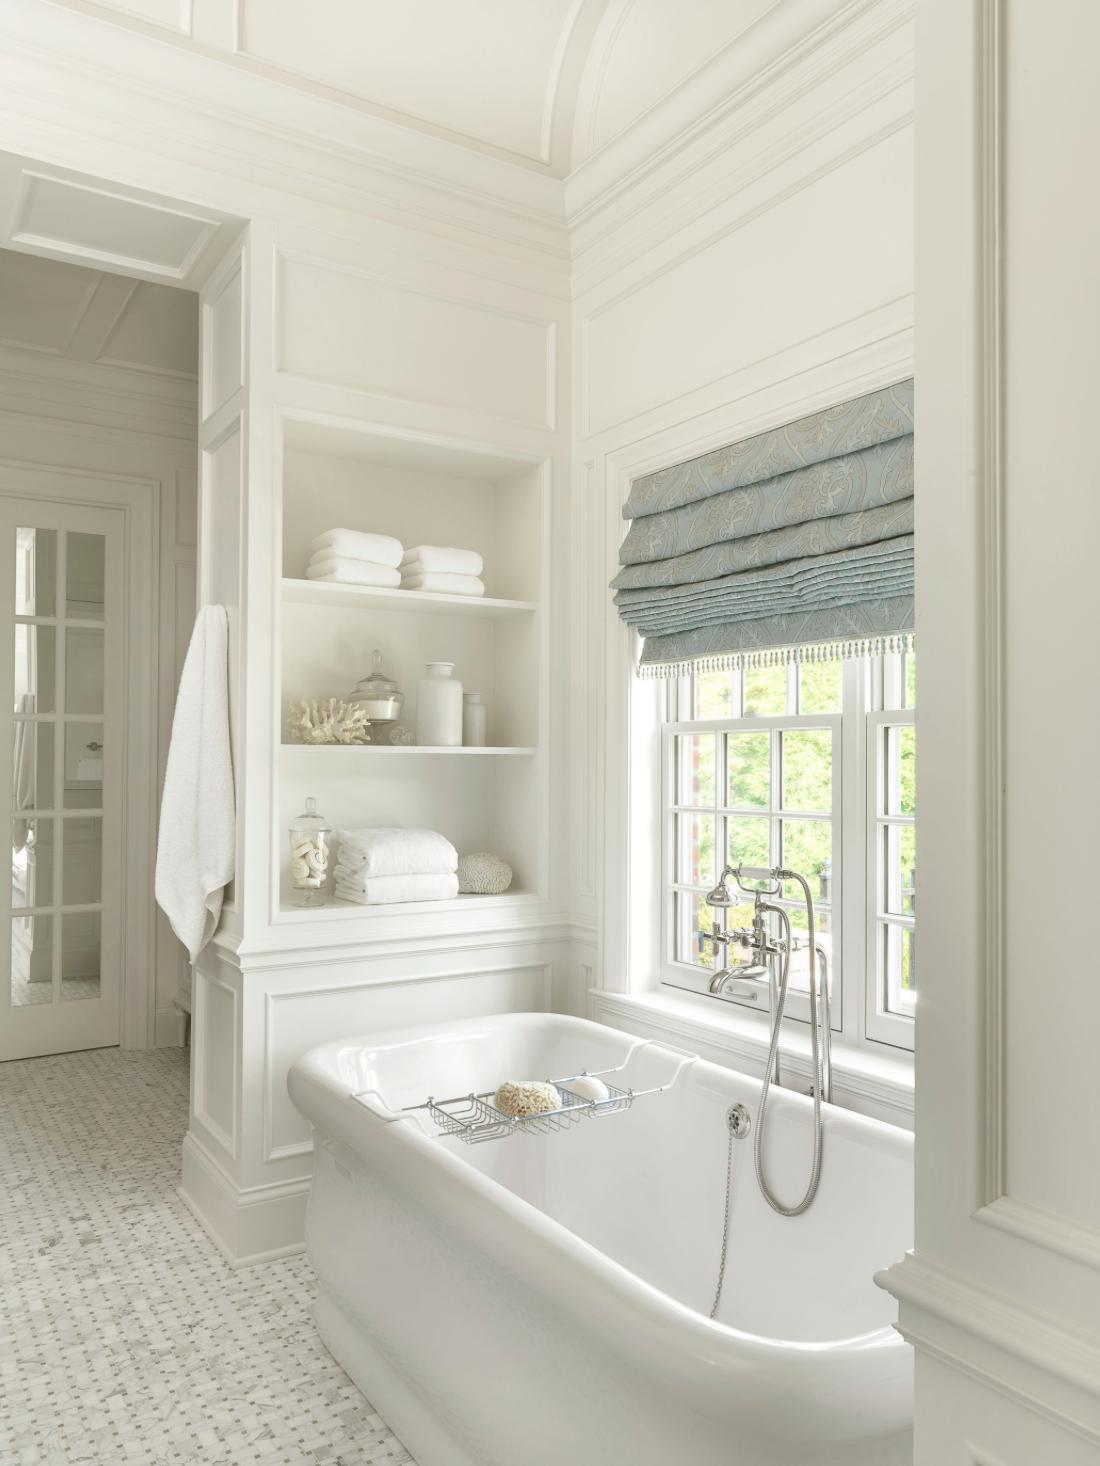 The 15 Most Beautiful Bathrooms on Pinterest – Sanctuary Home Decor